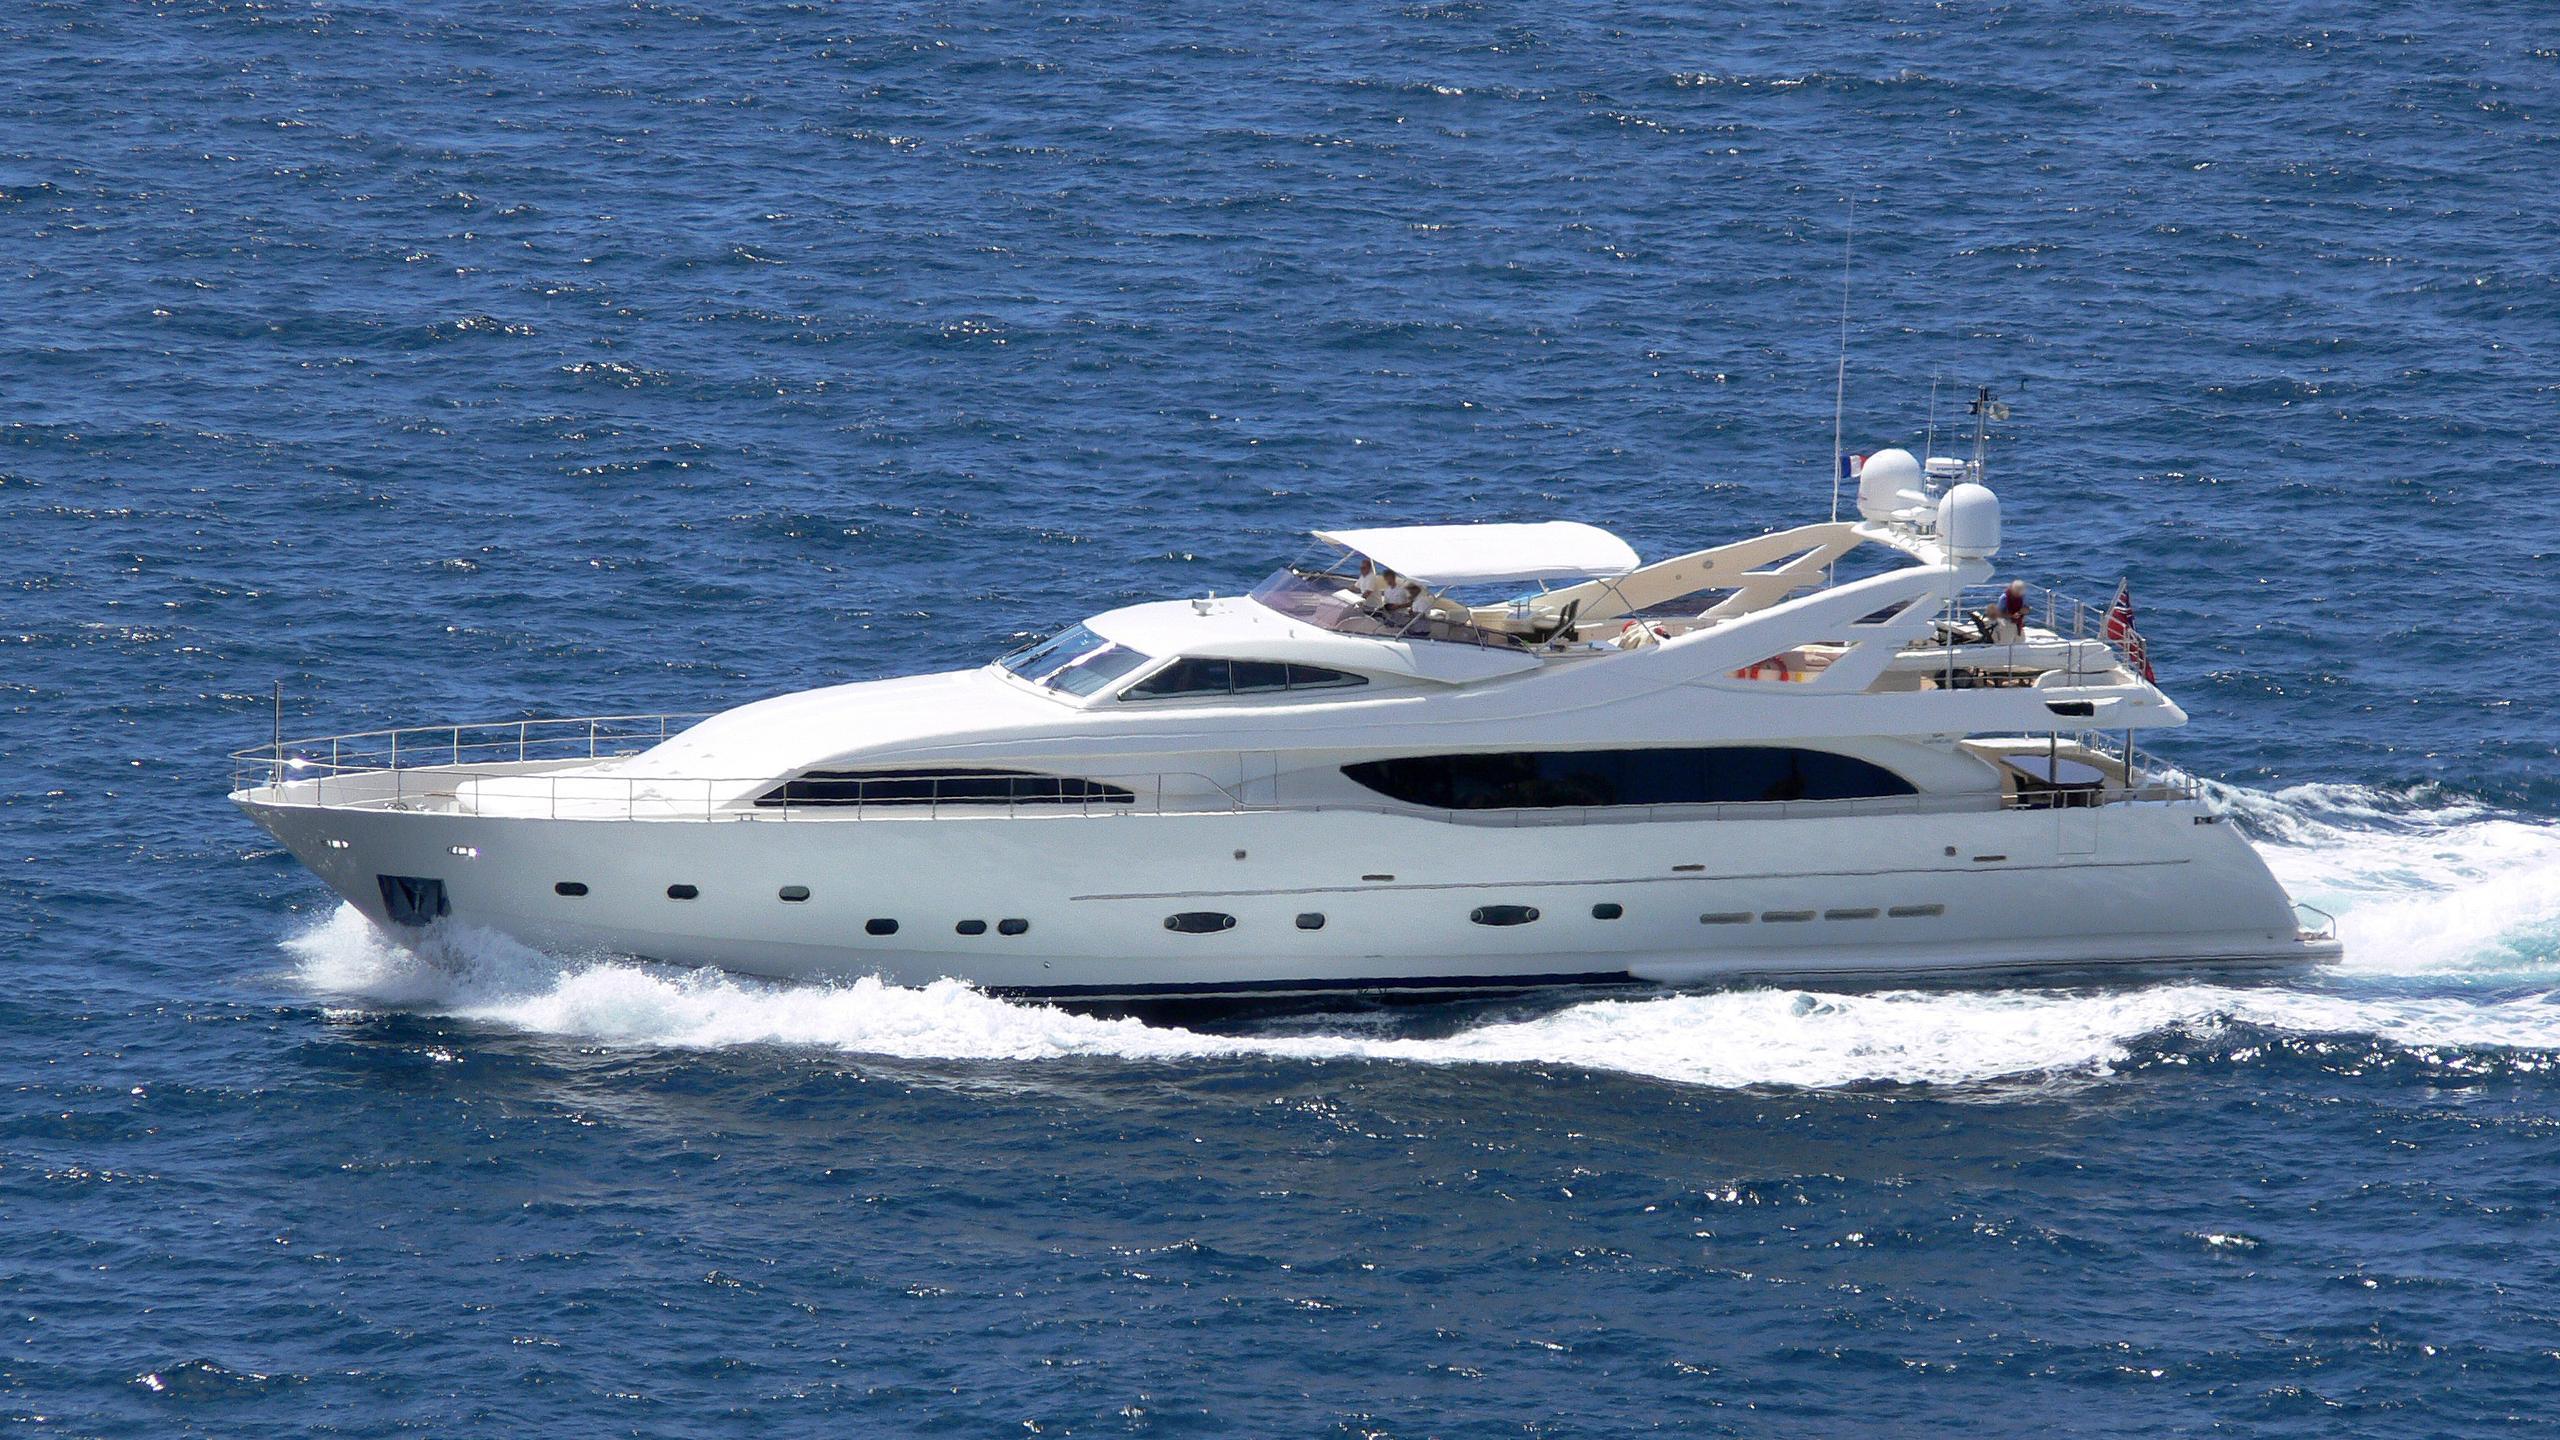 gazou-motor-yacht-ferretti-custom-line-115-2006-34m-running-profile